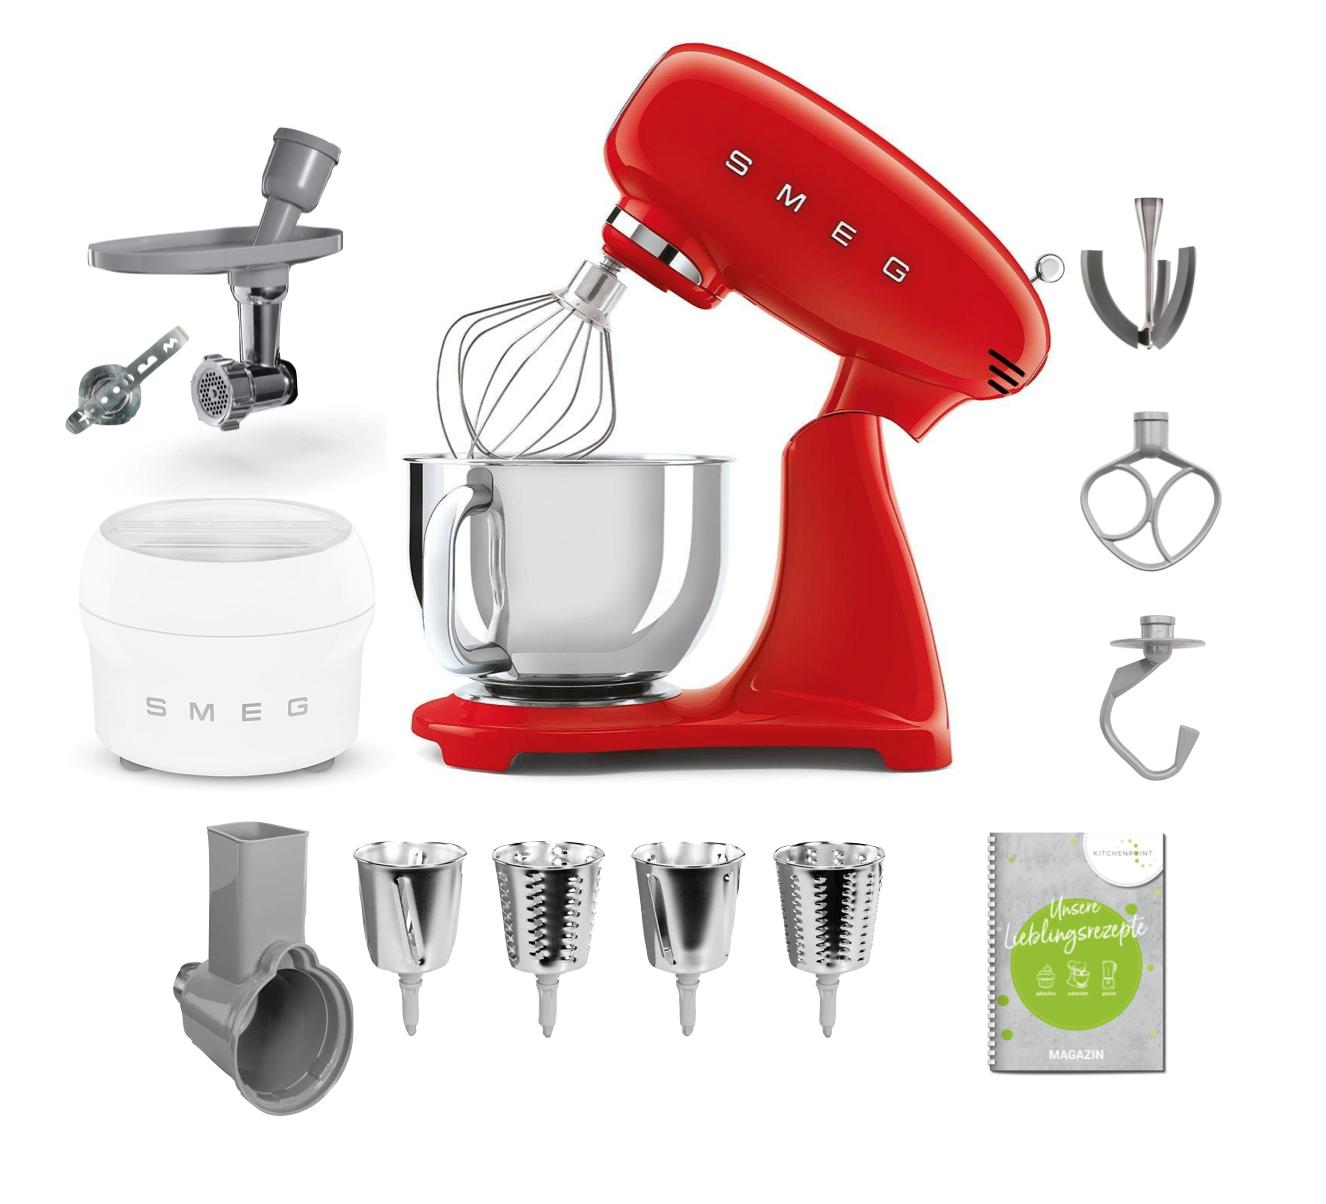 SMEG Küchenmaschine SMF03 Vollfarbe - Gourmet Set Rot